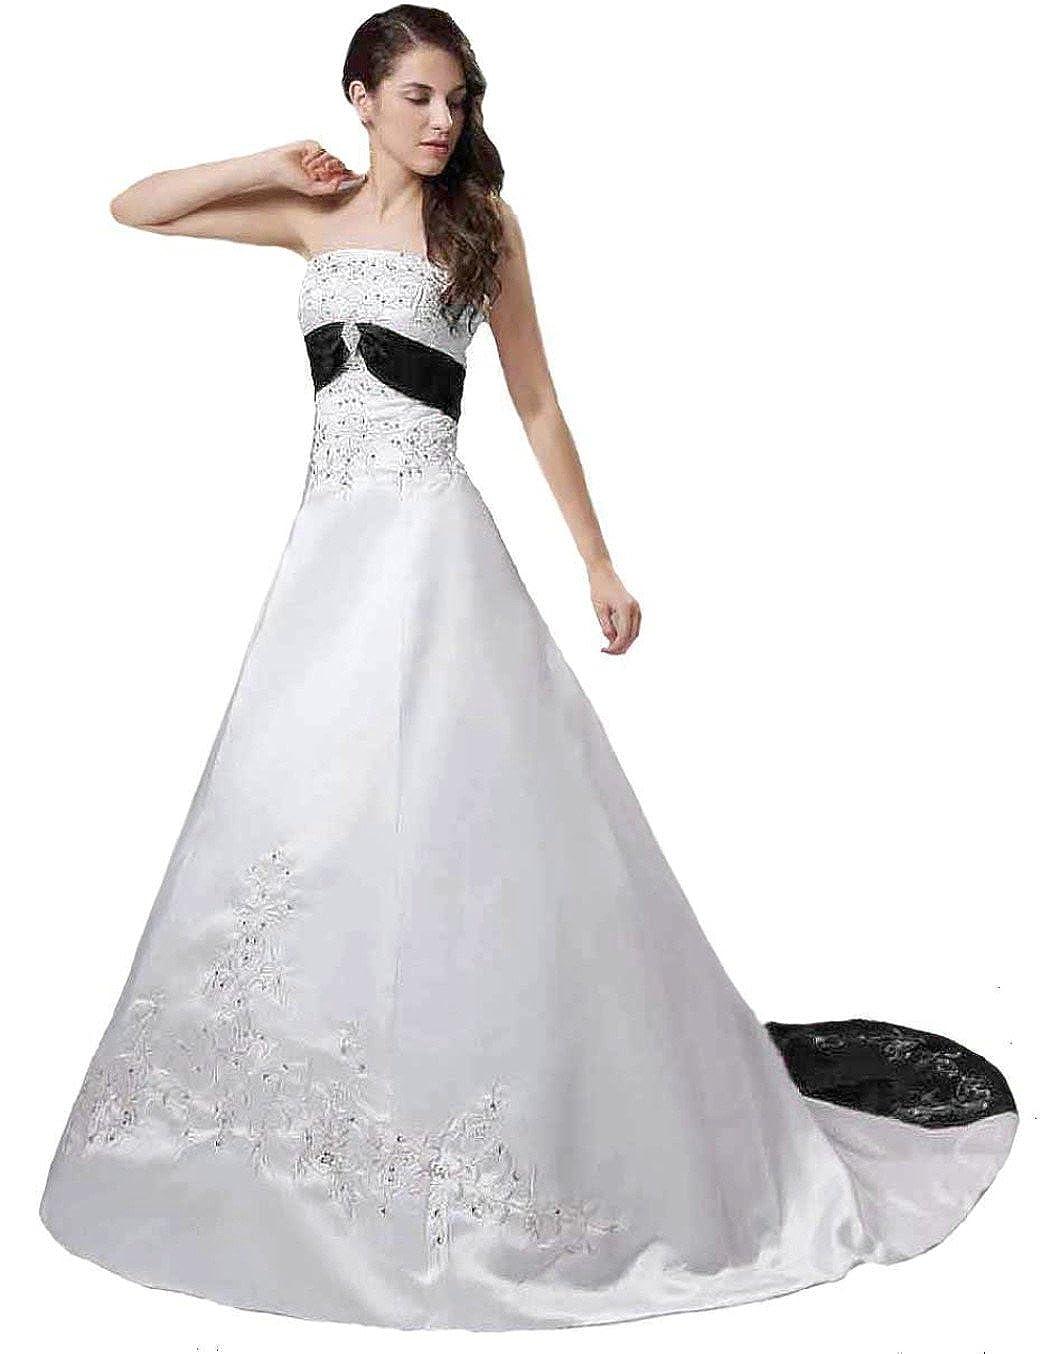 RohmBridal Womens Vintage Satin Embroidery Bridal Wedding Dresses Chapel Train